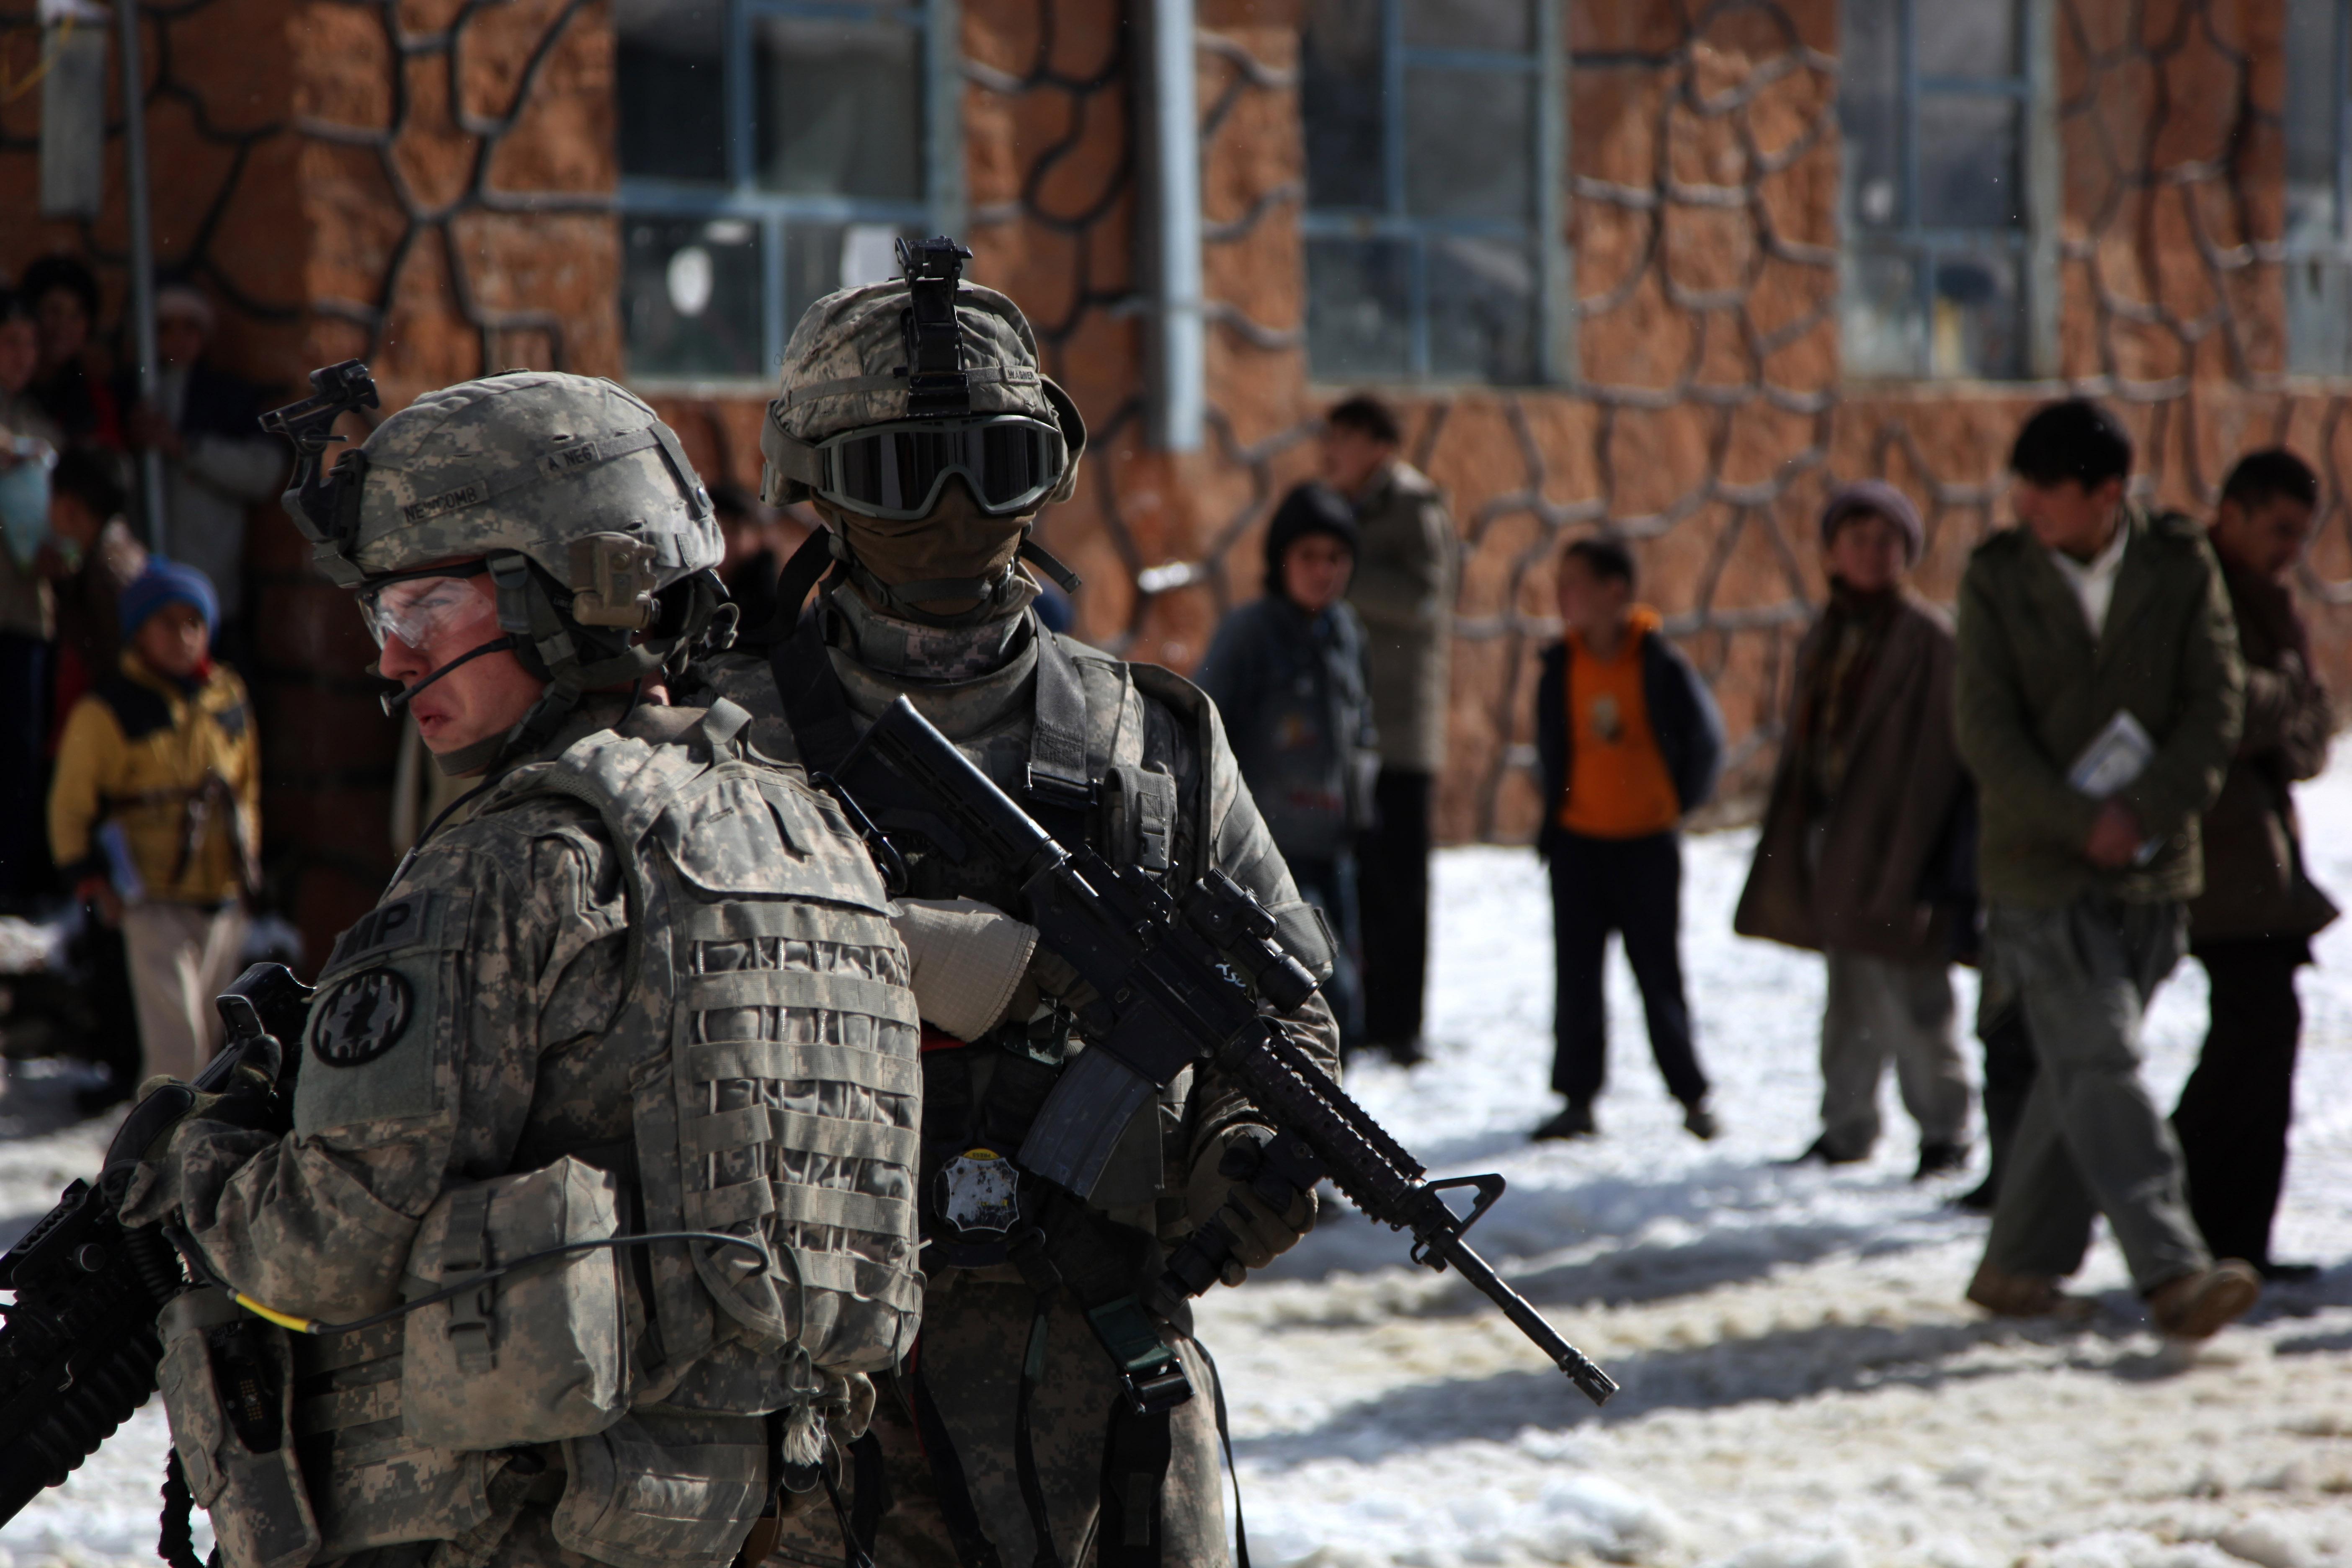 File:Defense.gov News Photo 091125-A-4902A-008.jpg - Wikimedia Commons